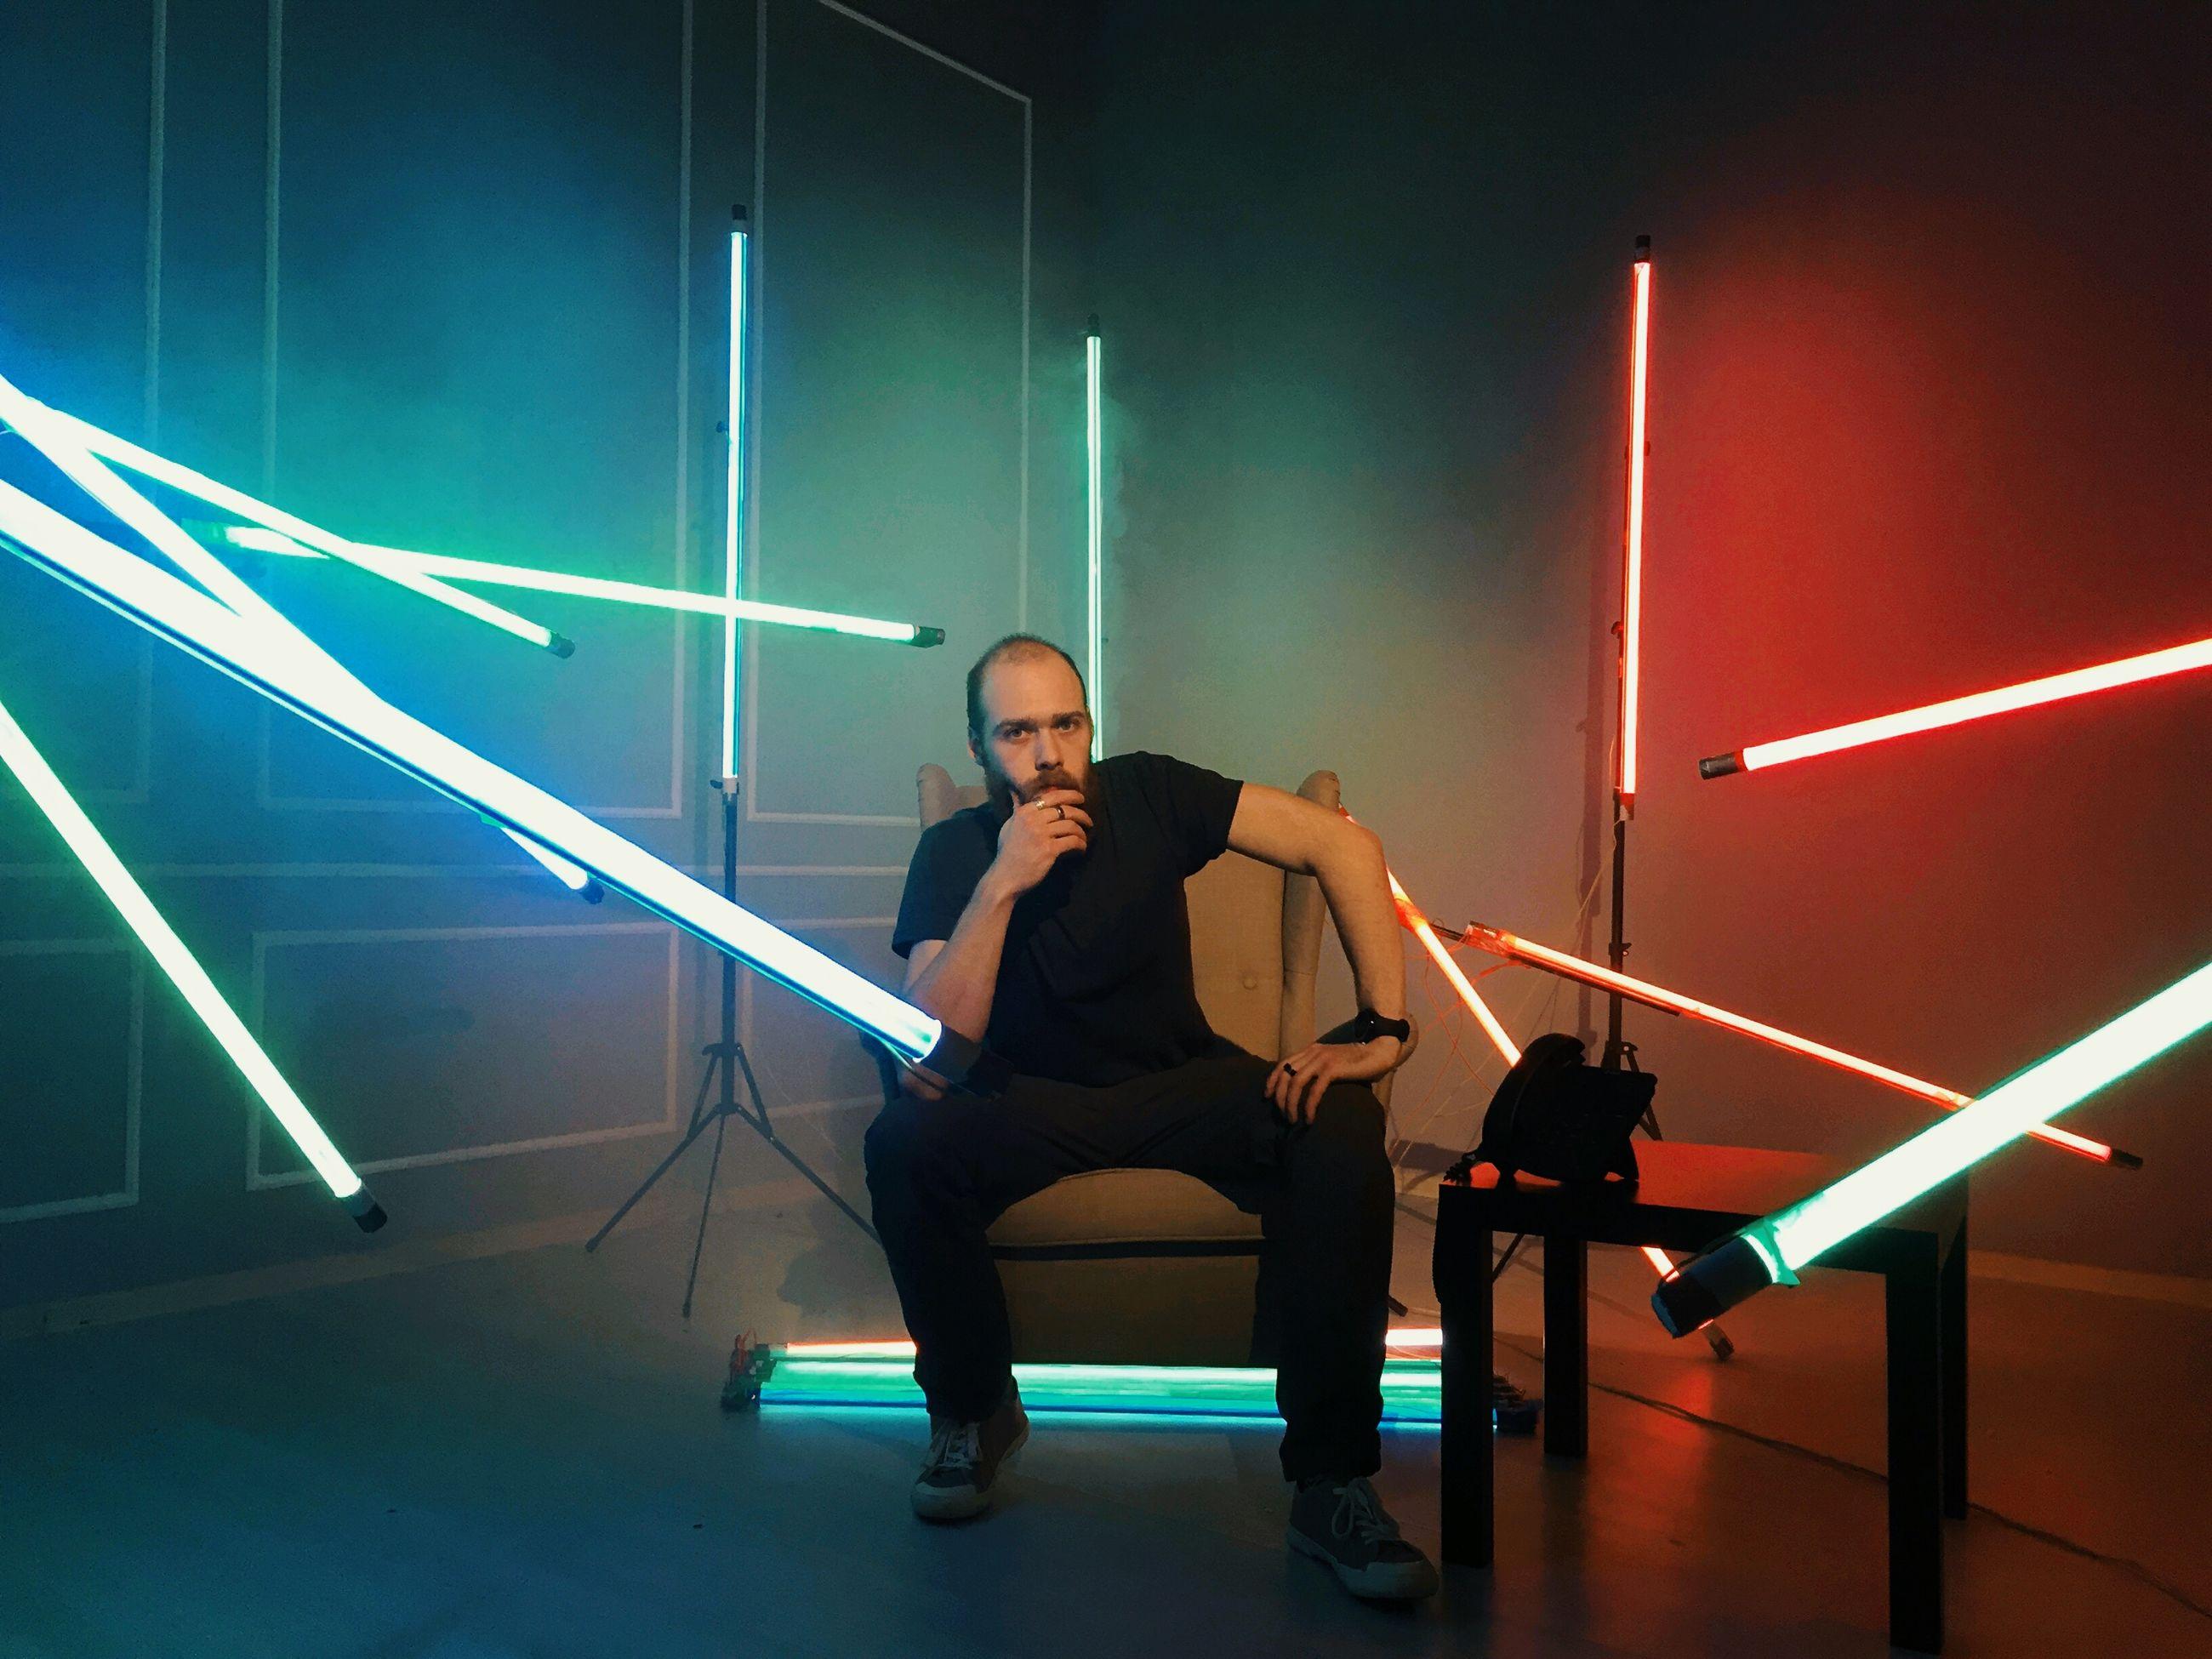 Portrait of man sitting in illuminated room